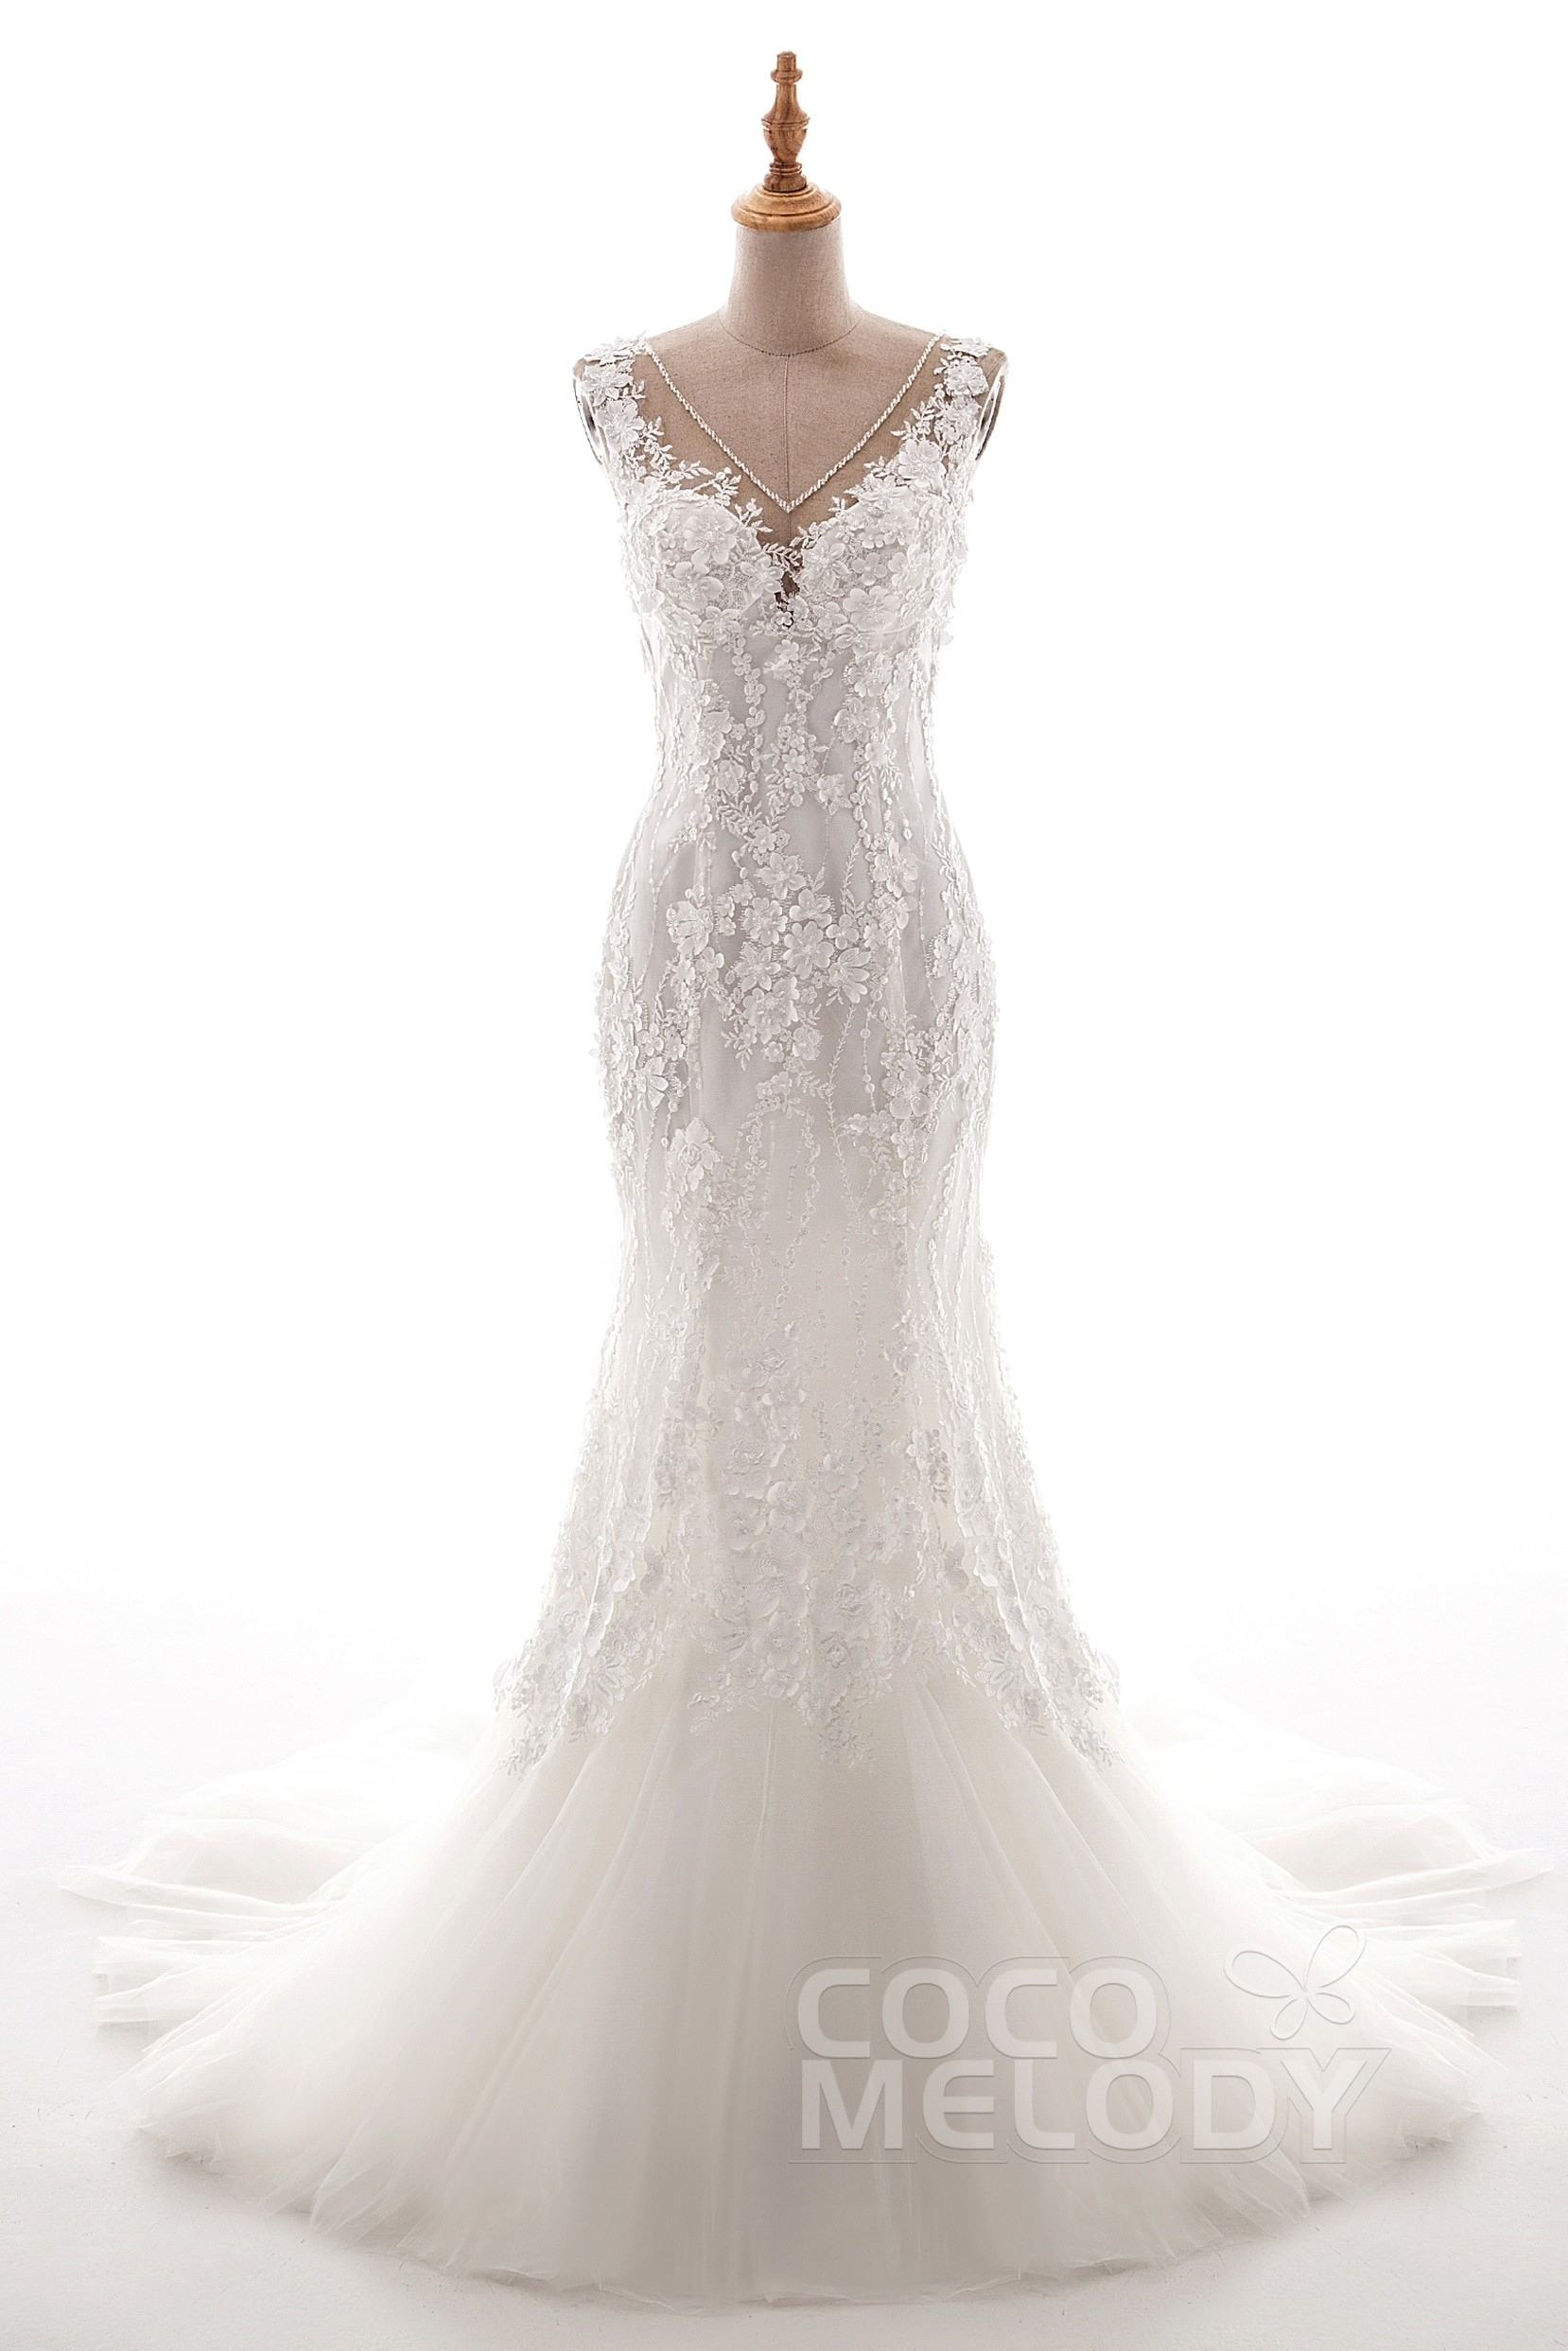 ed878cf7f47 Trumpet-Mermaid Court Train Tulle Lace Wedding Dress LD5058